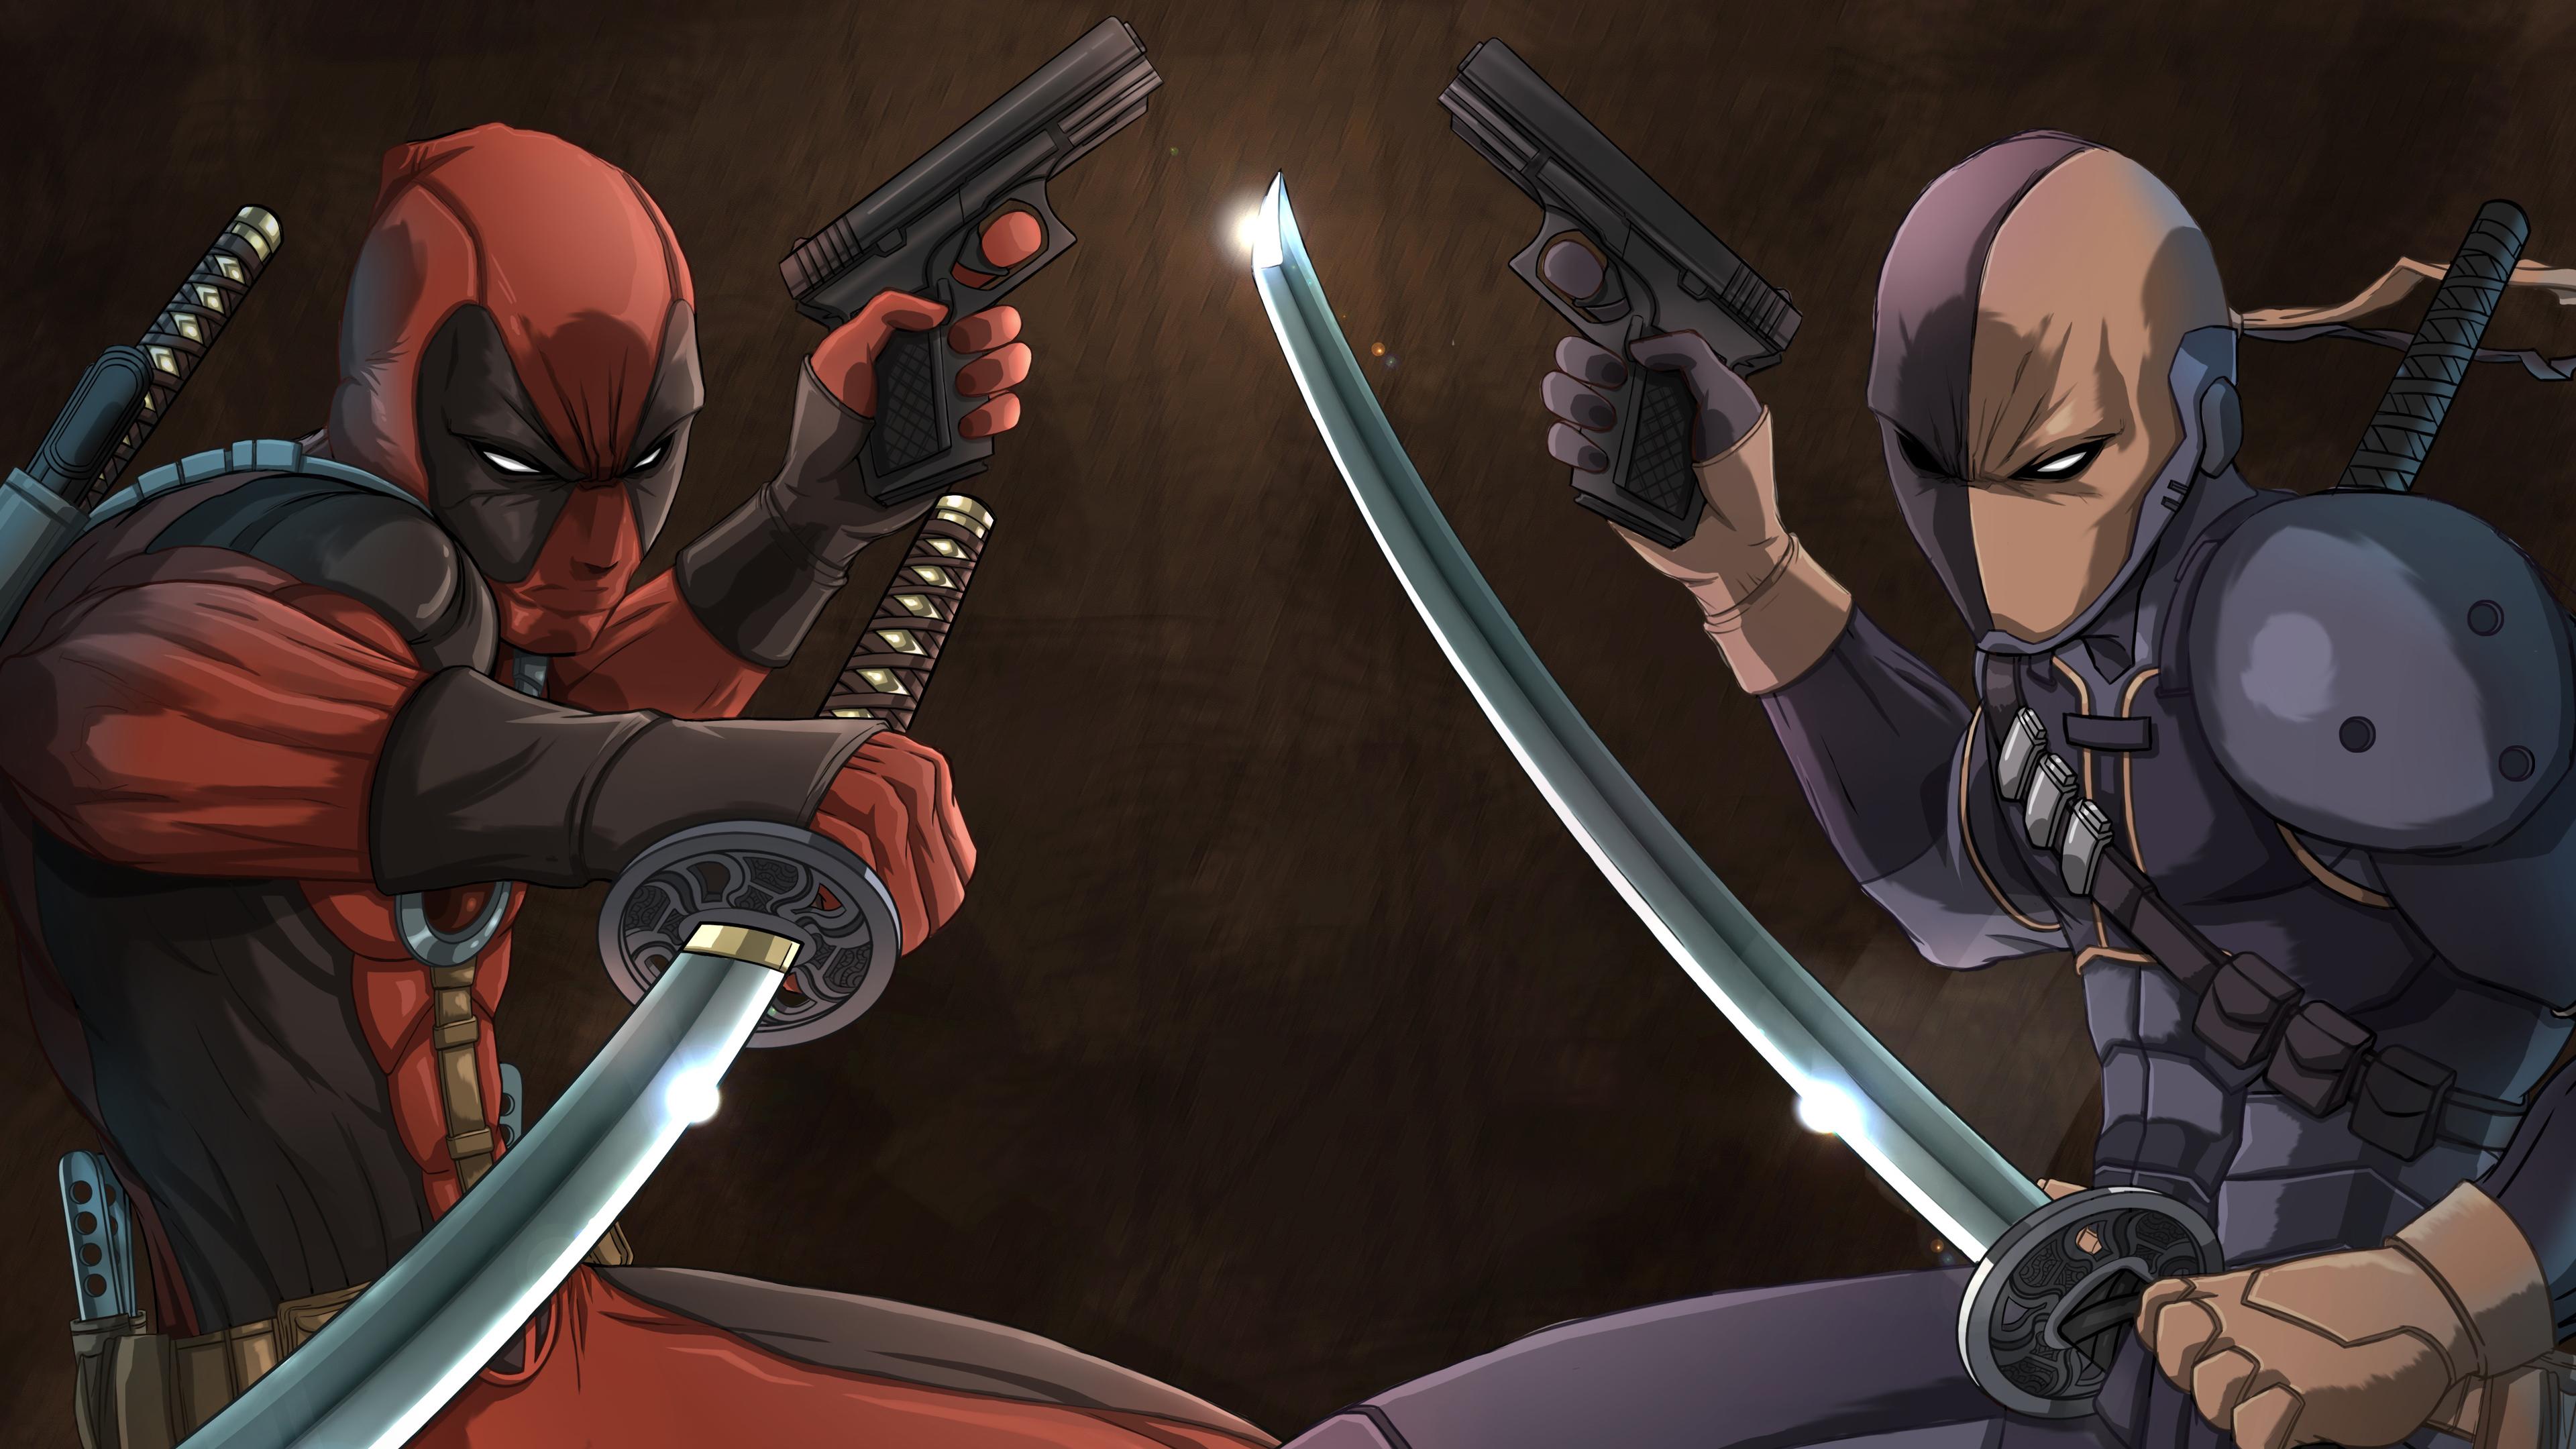 deadpool vs deathstroke 4k 1541294332 - Deadpool Vs Deathstroke 4k - superheroes wallpapers, hd-wallpapers, digital art wallpapers, deviantart wallpapers, deathstroke wallpapers, deadpool wallpapers, artwork wallpapers, 4k-wallpapers